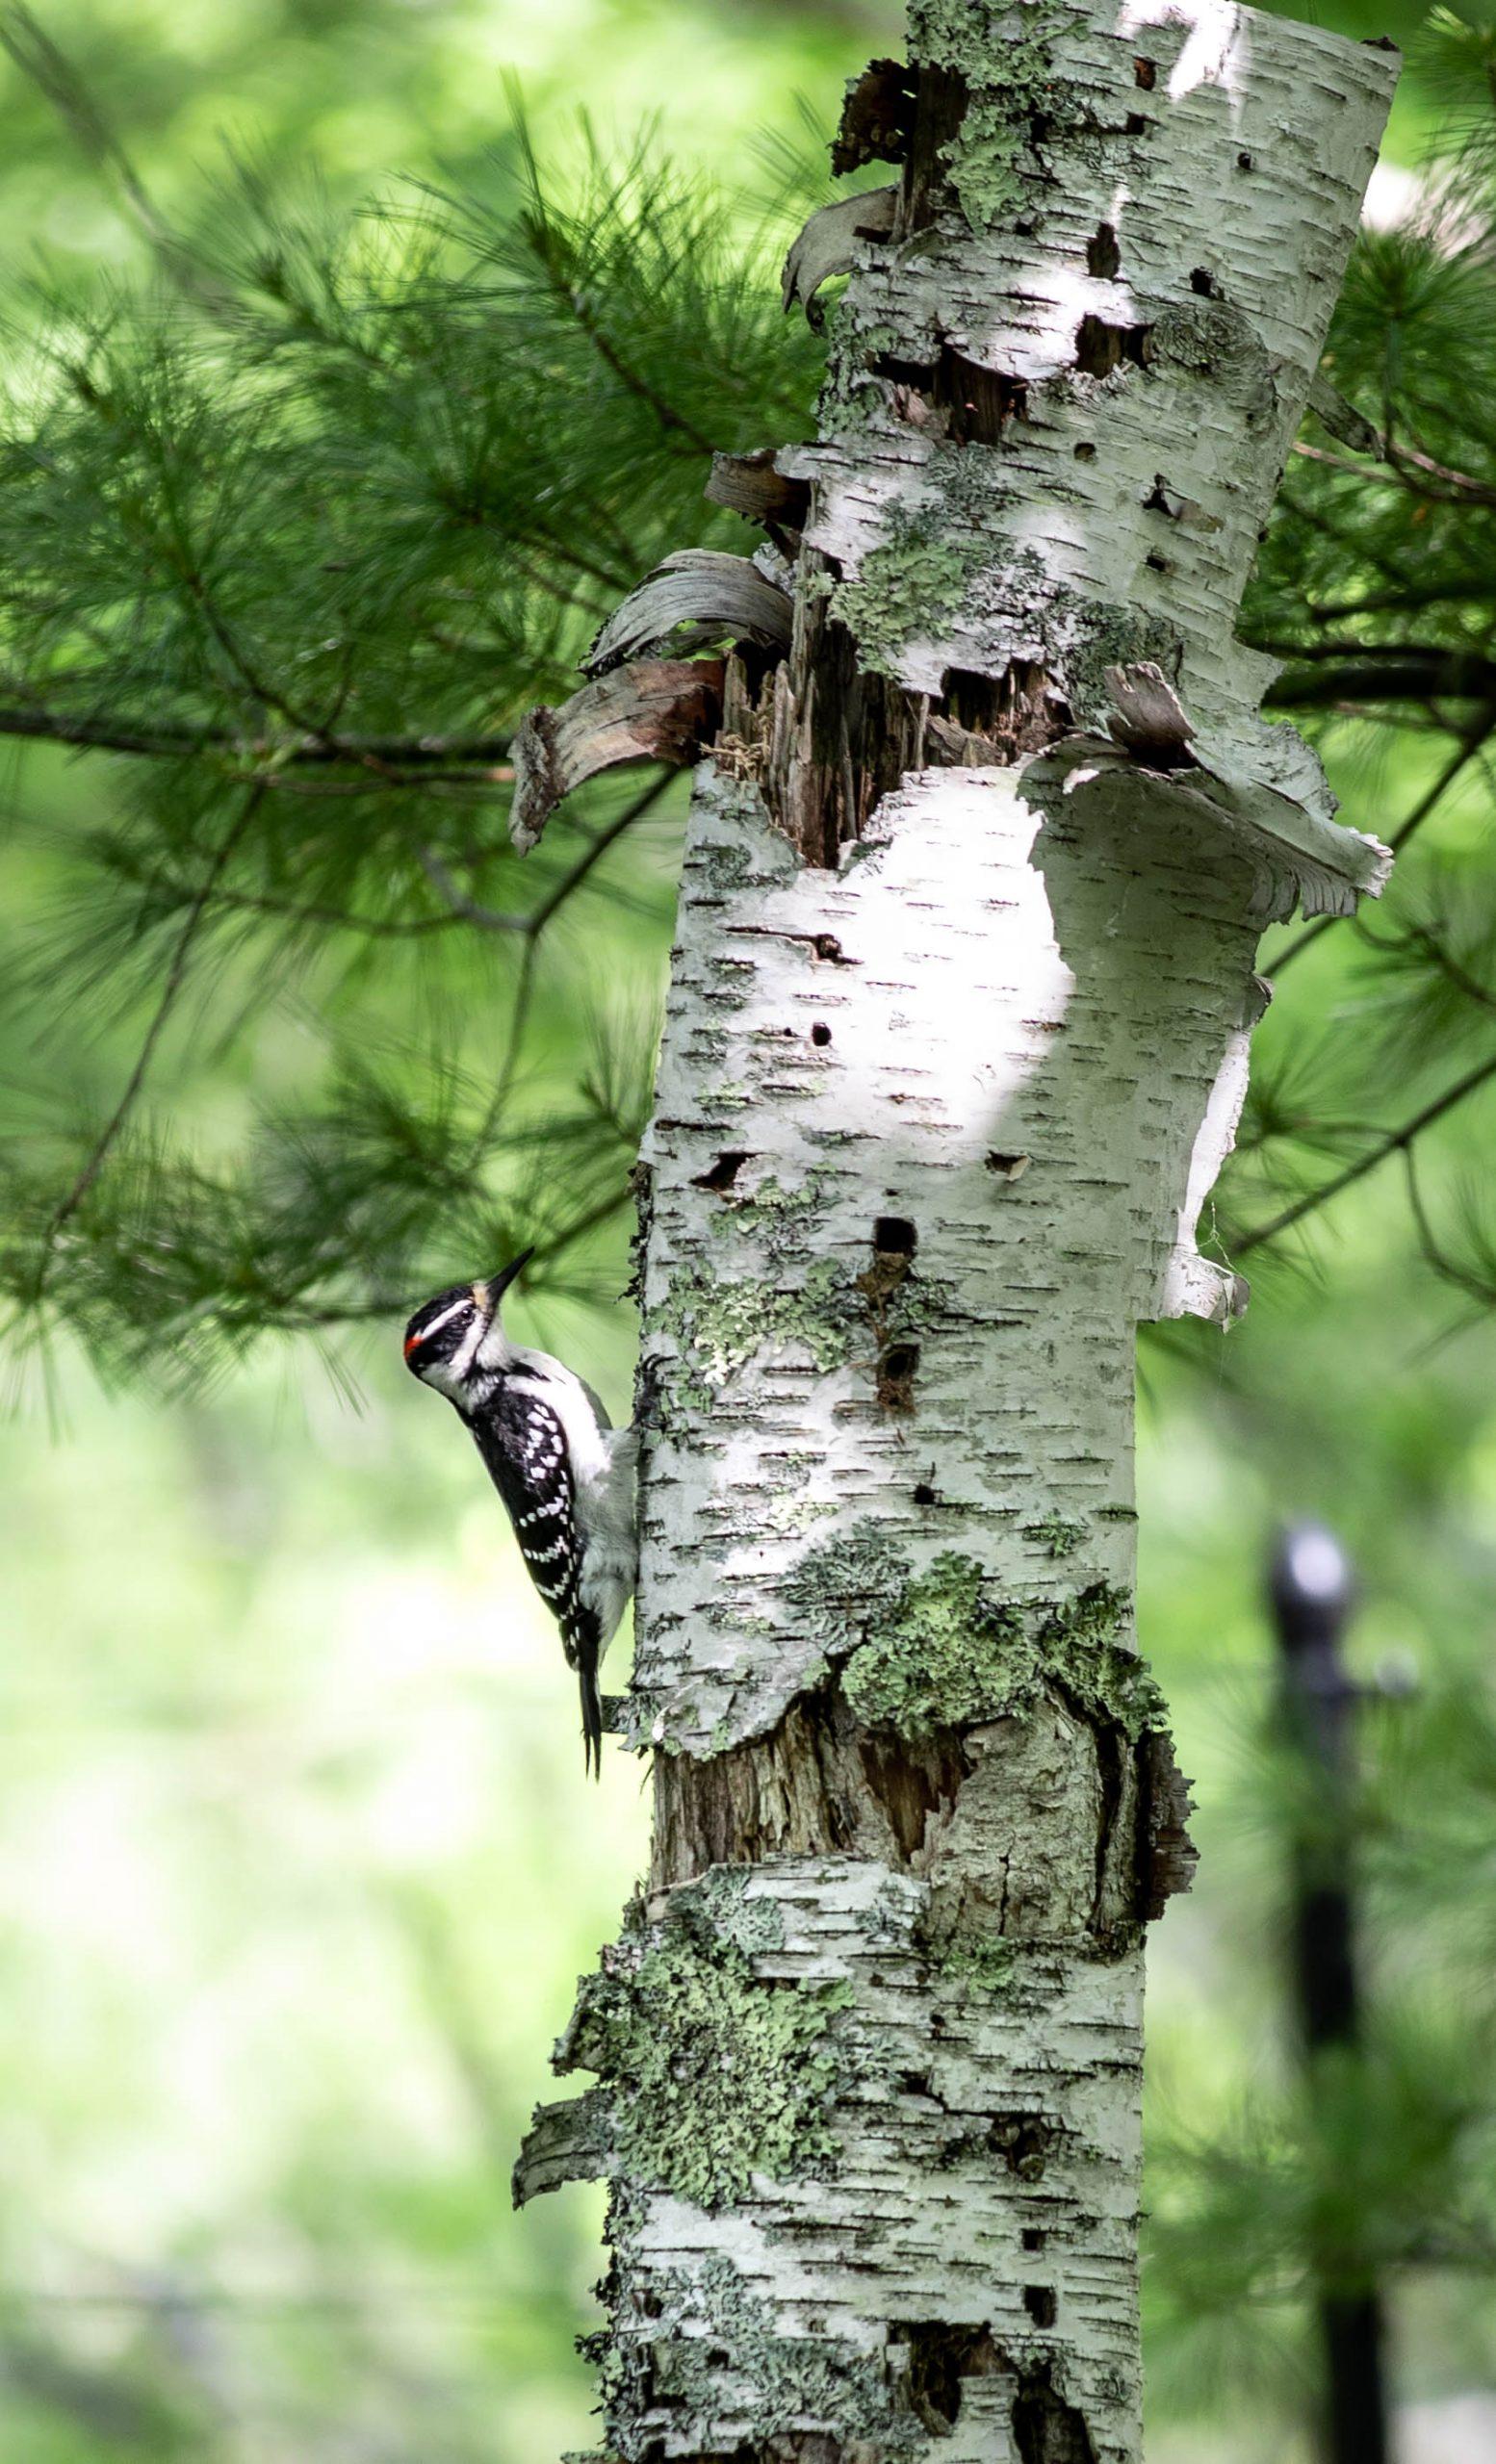 Woodpecker Wild Gardens of Acadia Botanical Garden inside Acadia National Park Mount Desert Island near Bar Harbor Maine Written and Photographed by Luxury Travel Writer Annie Fairfax